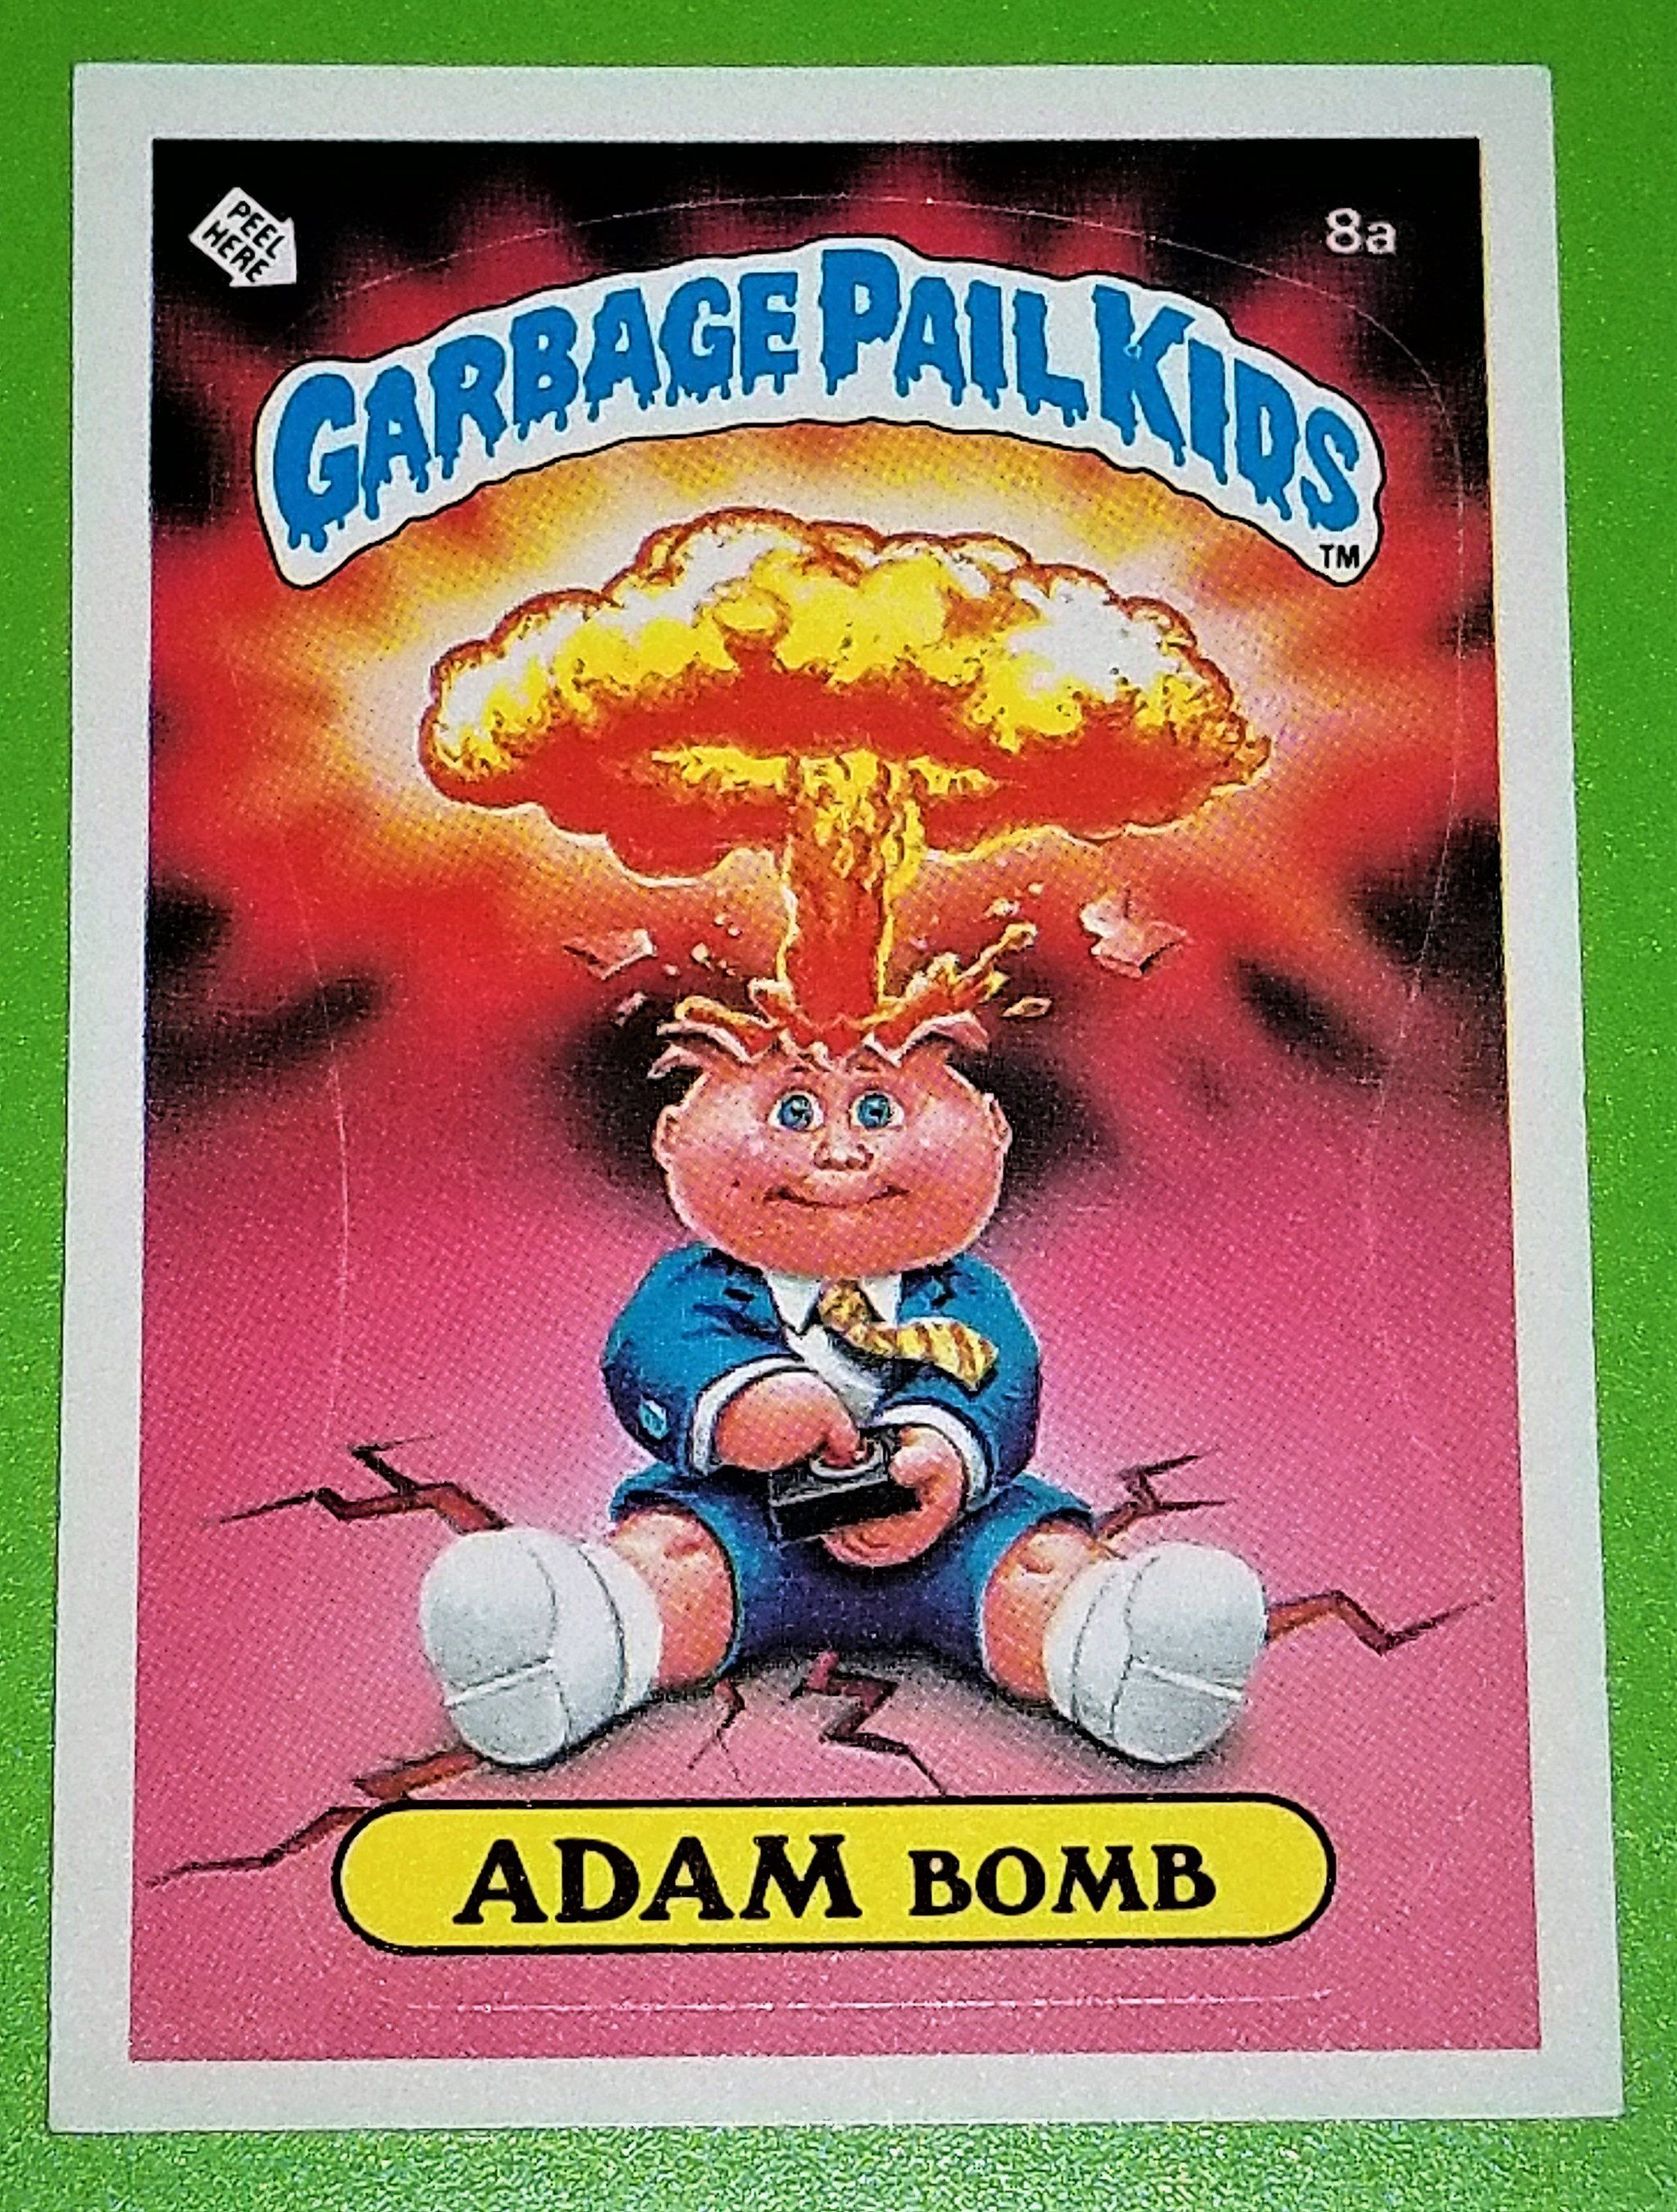 f2c655e3b2e GARBAGE PAIL KIDS STICKER (WE HAVE THE BIG 3 ! ) 1985 ADAM BOMB 8a - MINT  CONDITION